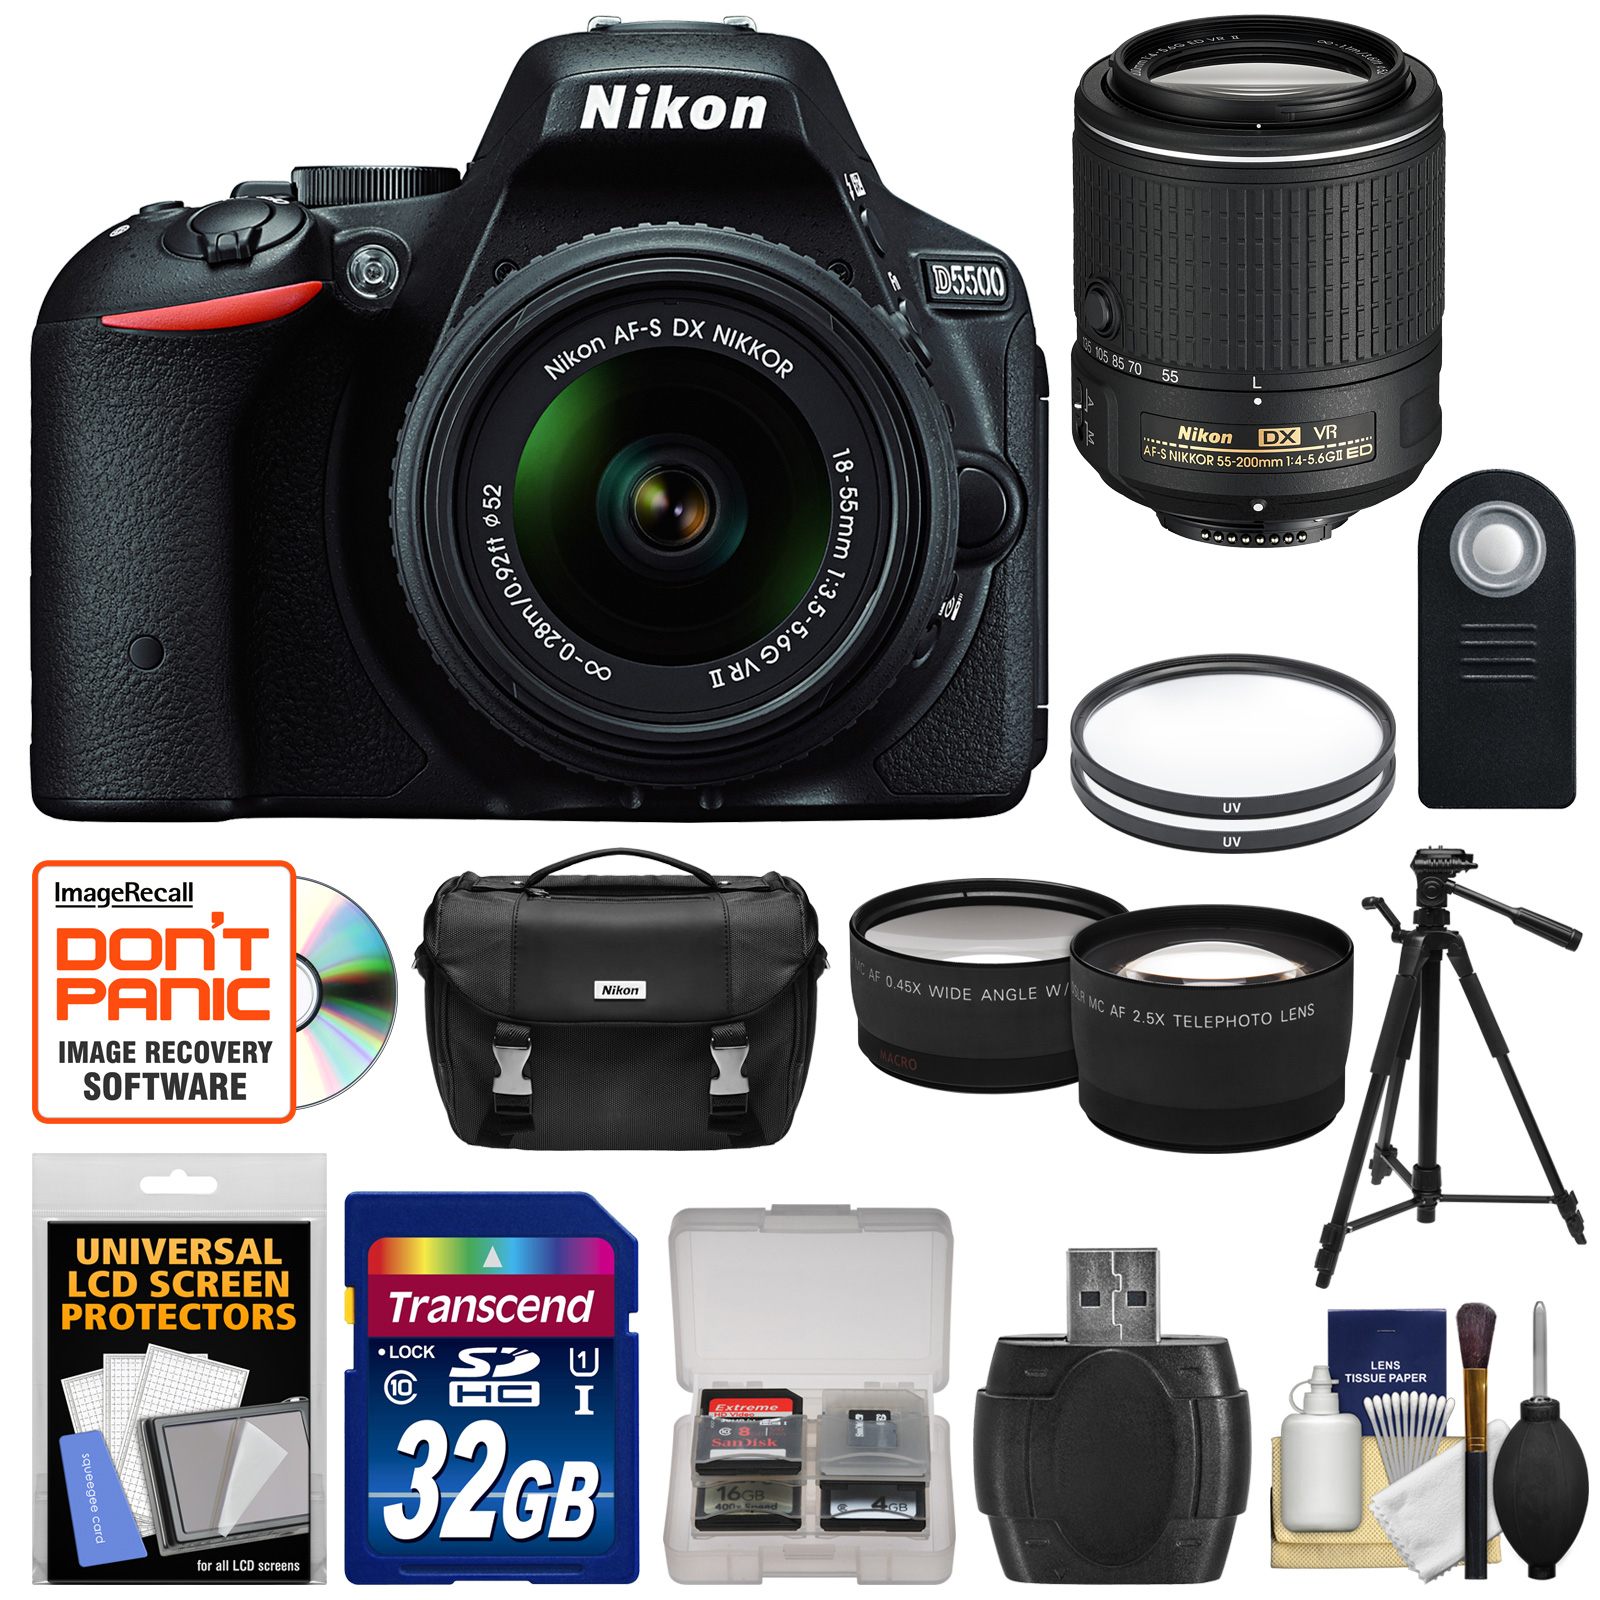 Nikon D5500 Wi-Fi Digital SLR Camera & 18-55mm VR DX Lens (Black) - Factory Refurbished with 55-200mm VR Lens + 32GB Card + Case + Filters + Tripod + Kit 1546B-89925-Kit